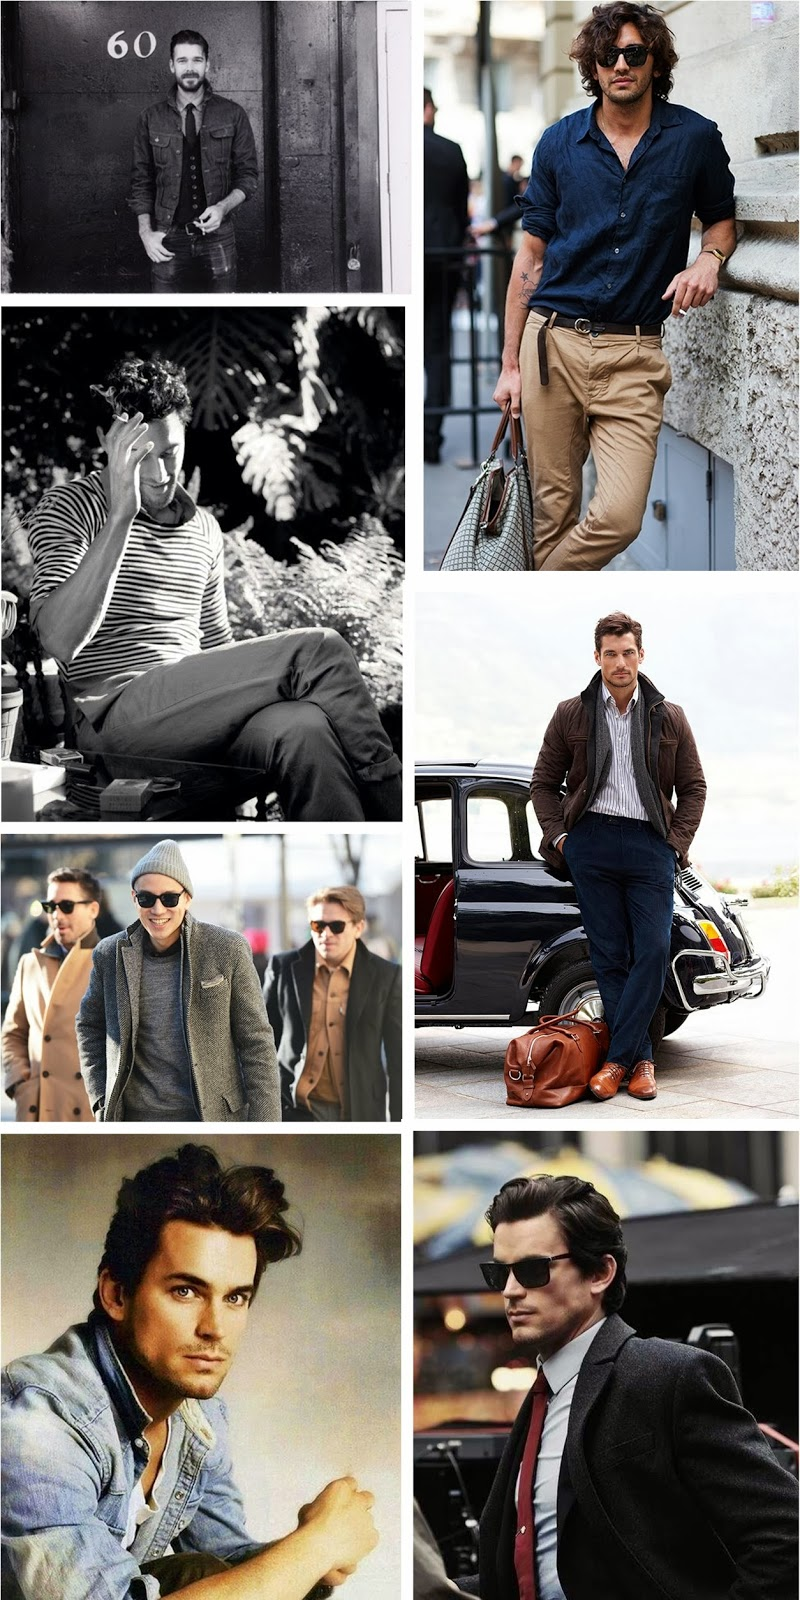 fashion blog blogger, style blogger blog, mens fashion, mens style, stylish men, inspiration, inspirational board, hot men, street style men, matt bomer style